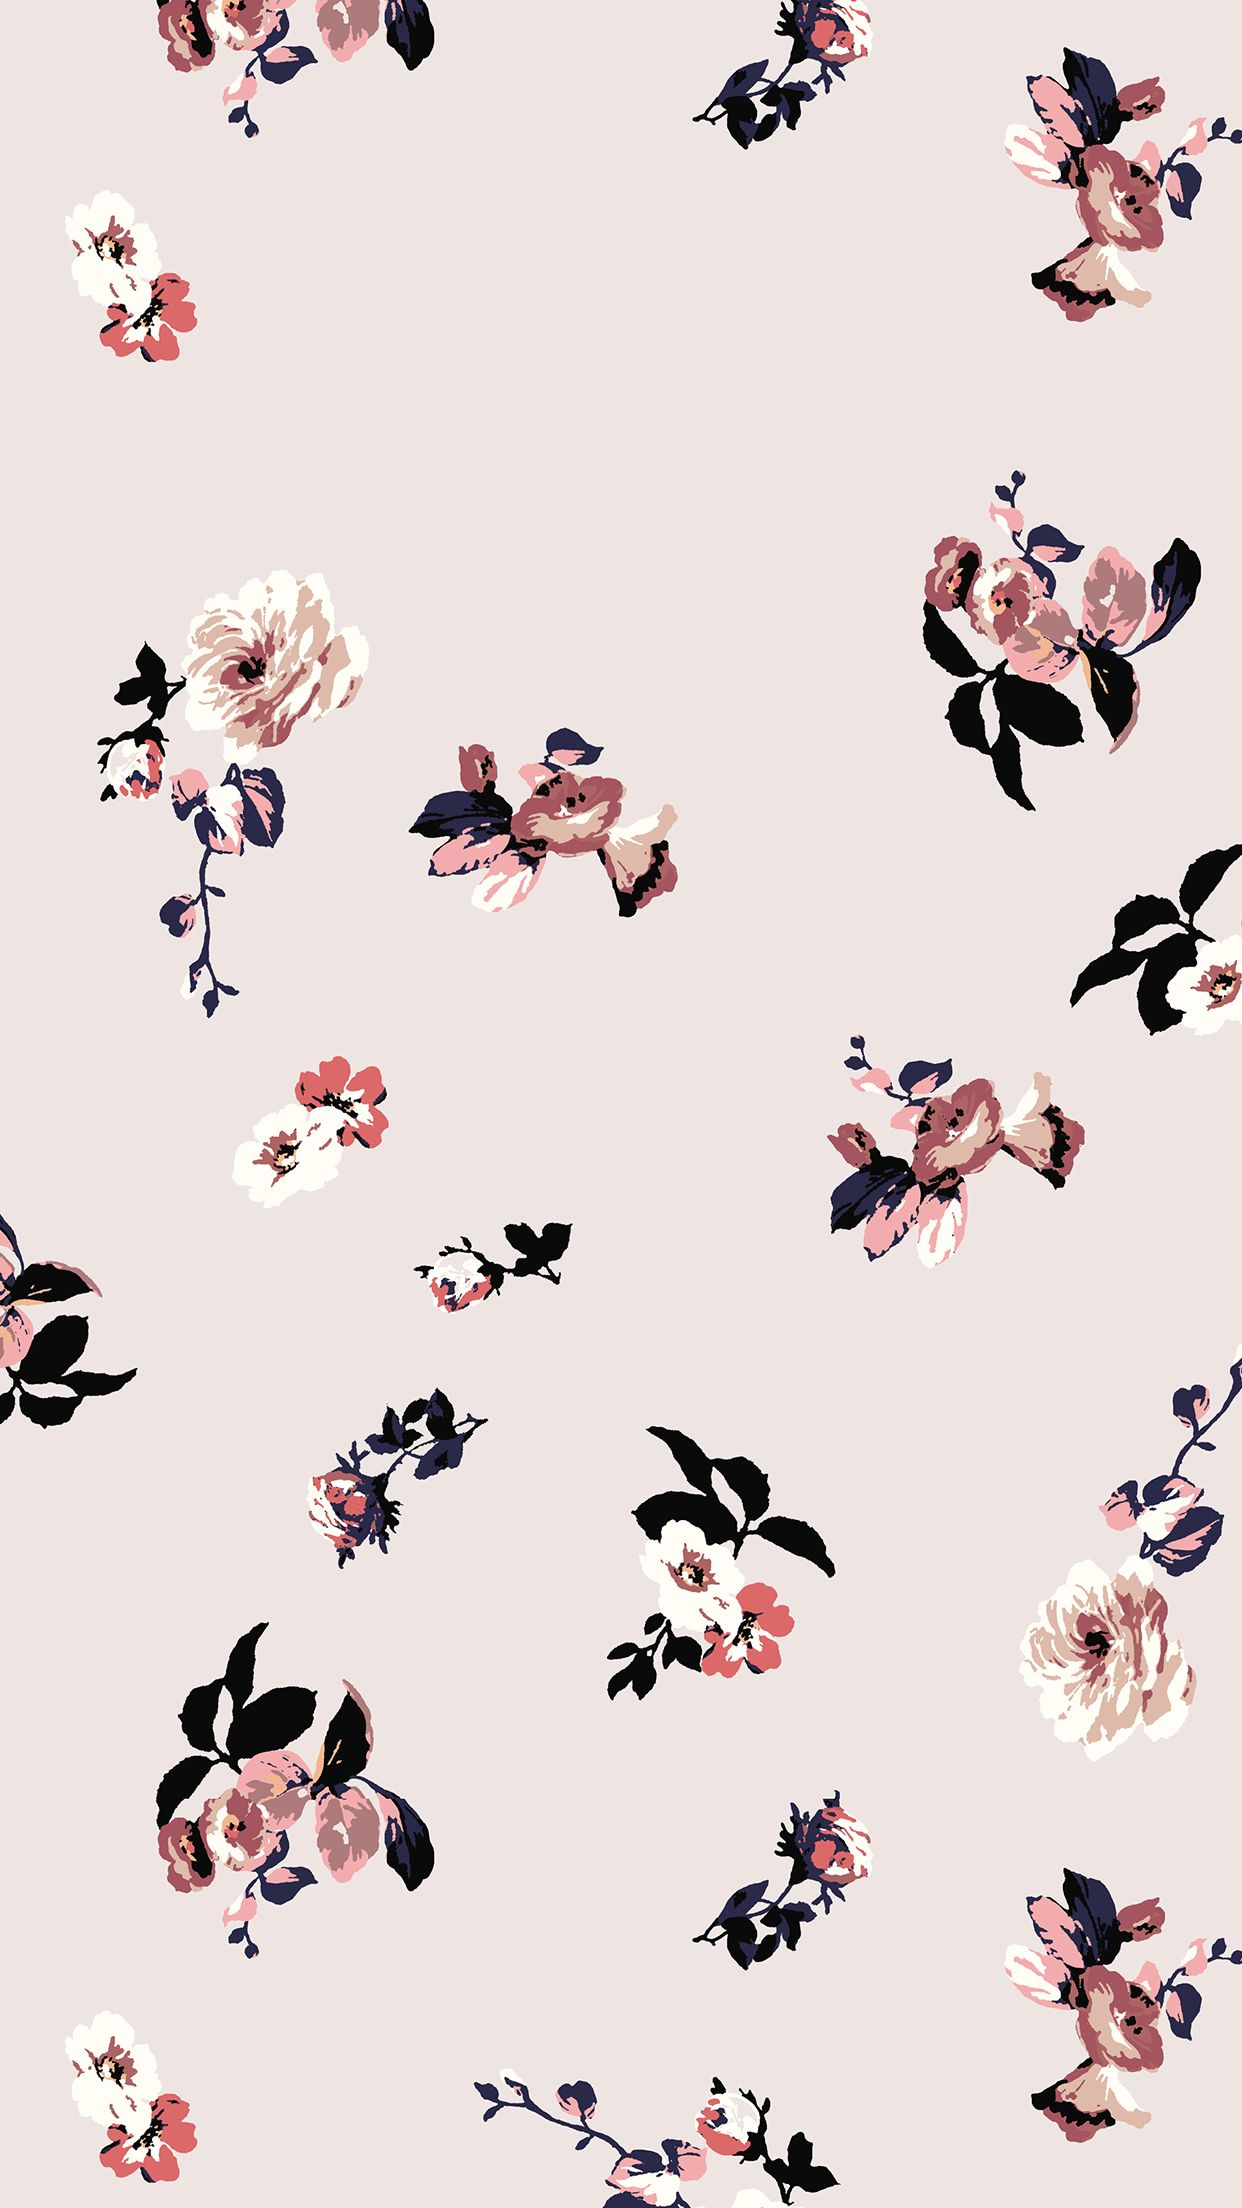 Pin By Prateek Khanna On W A L L P A P E R I P H O N E Screensaver Iphone Wallpaper Tumblr Lockscreen Screen Wallpaper